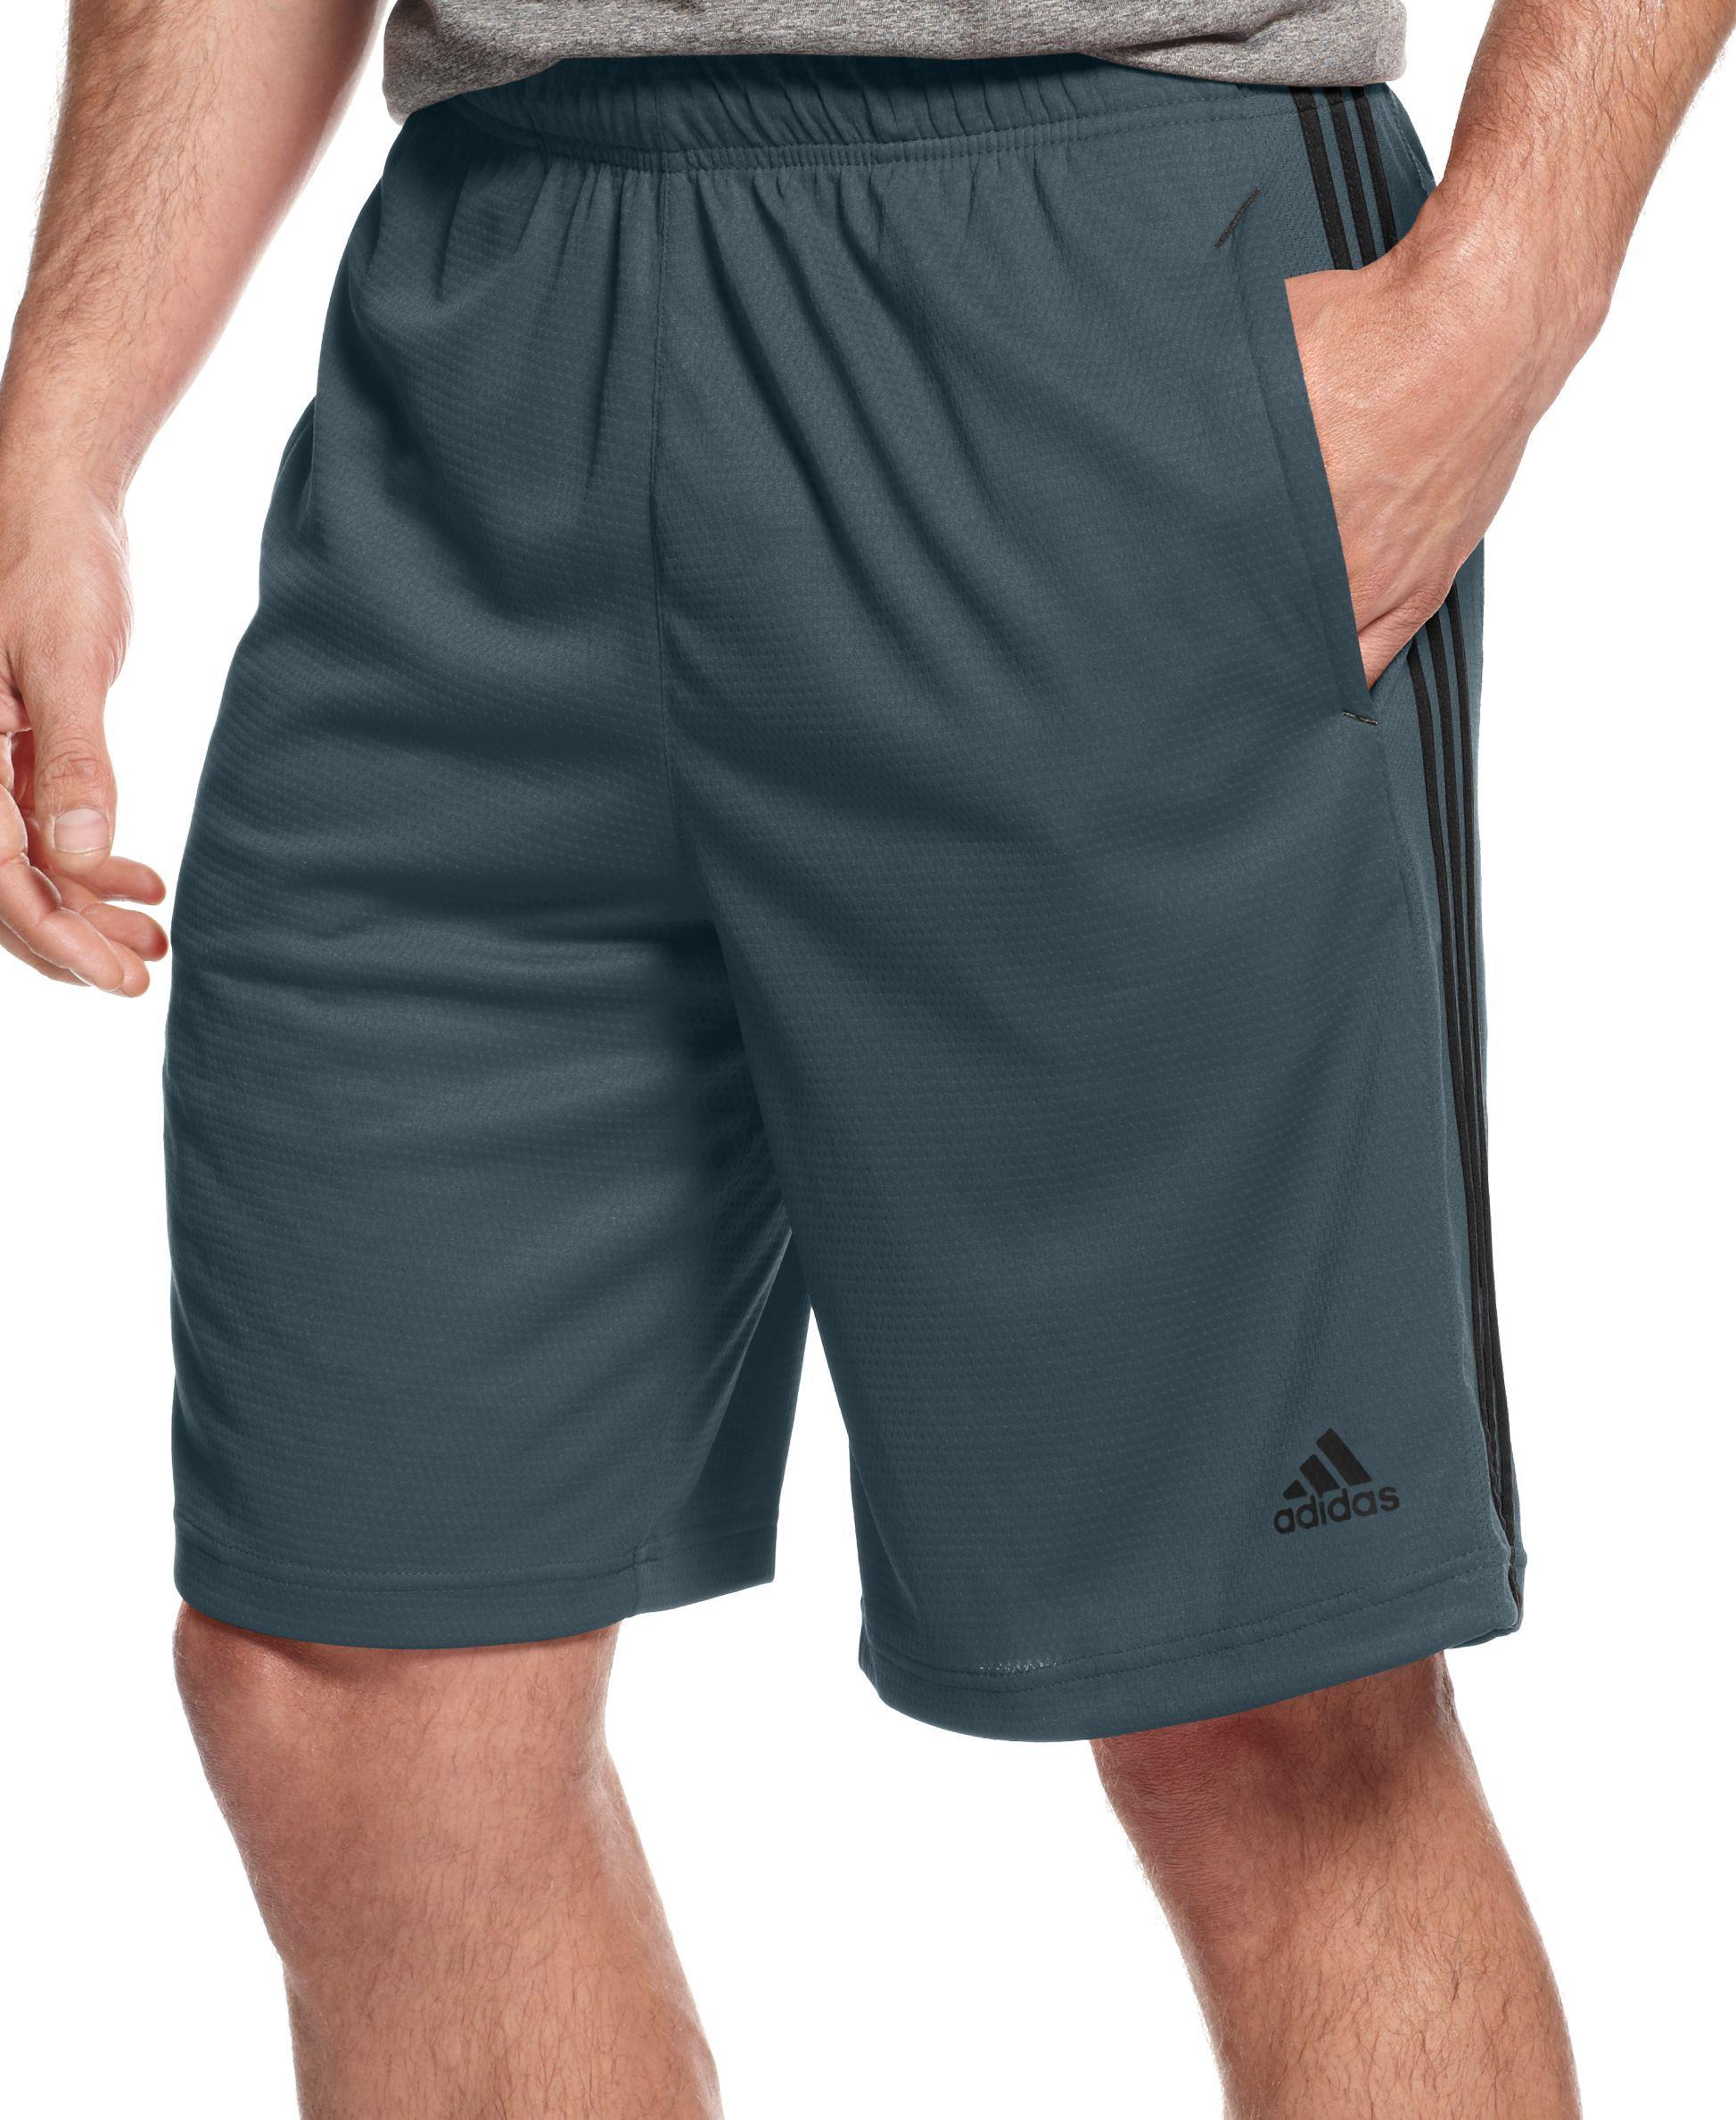 adidas Climalite Essential Shorts | Mens activewear, Adidas ...